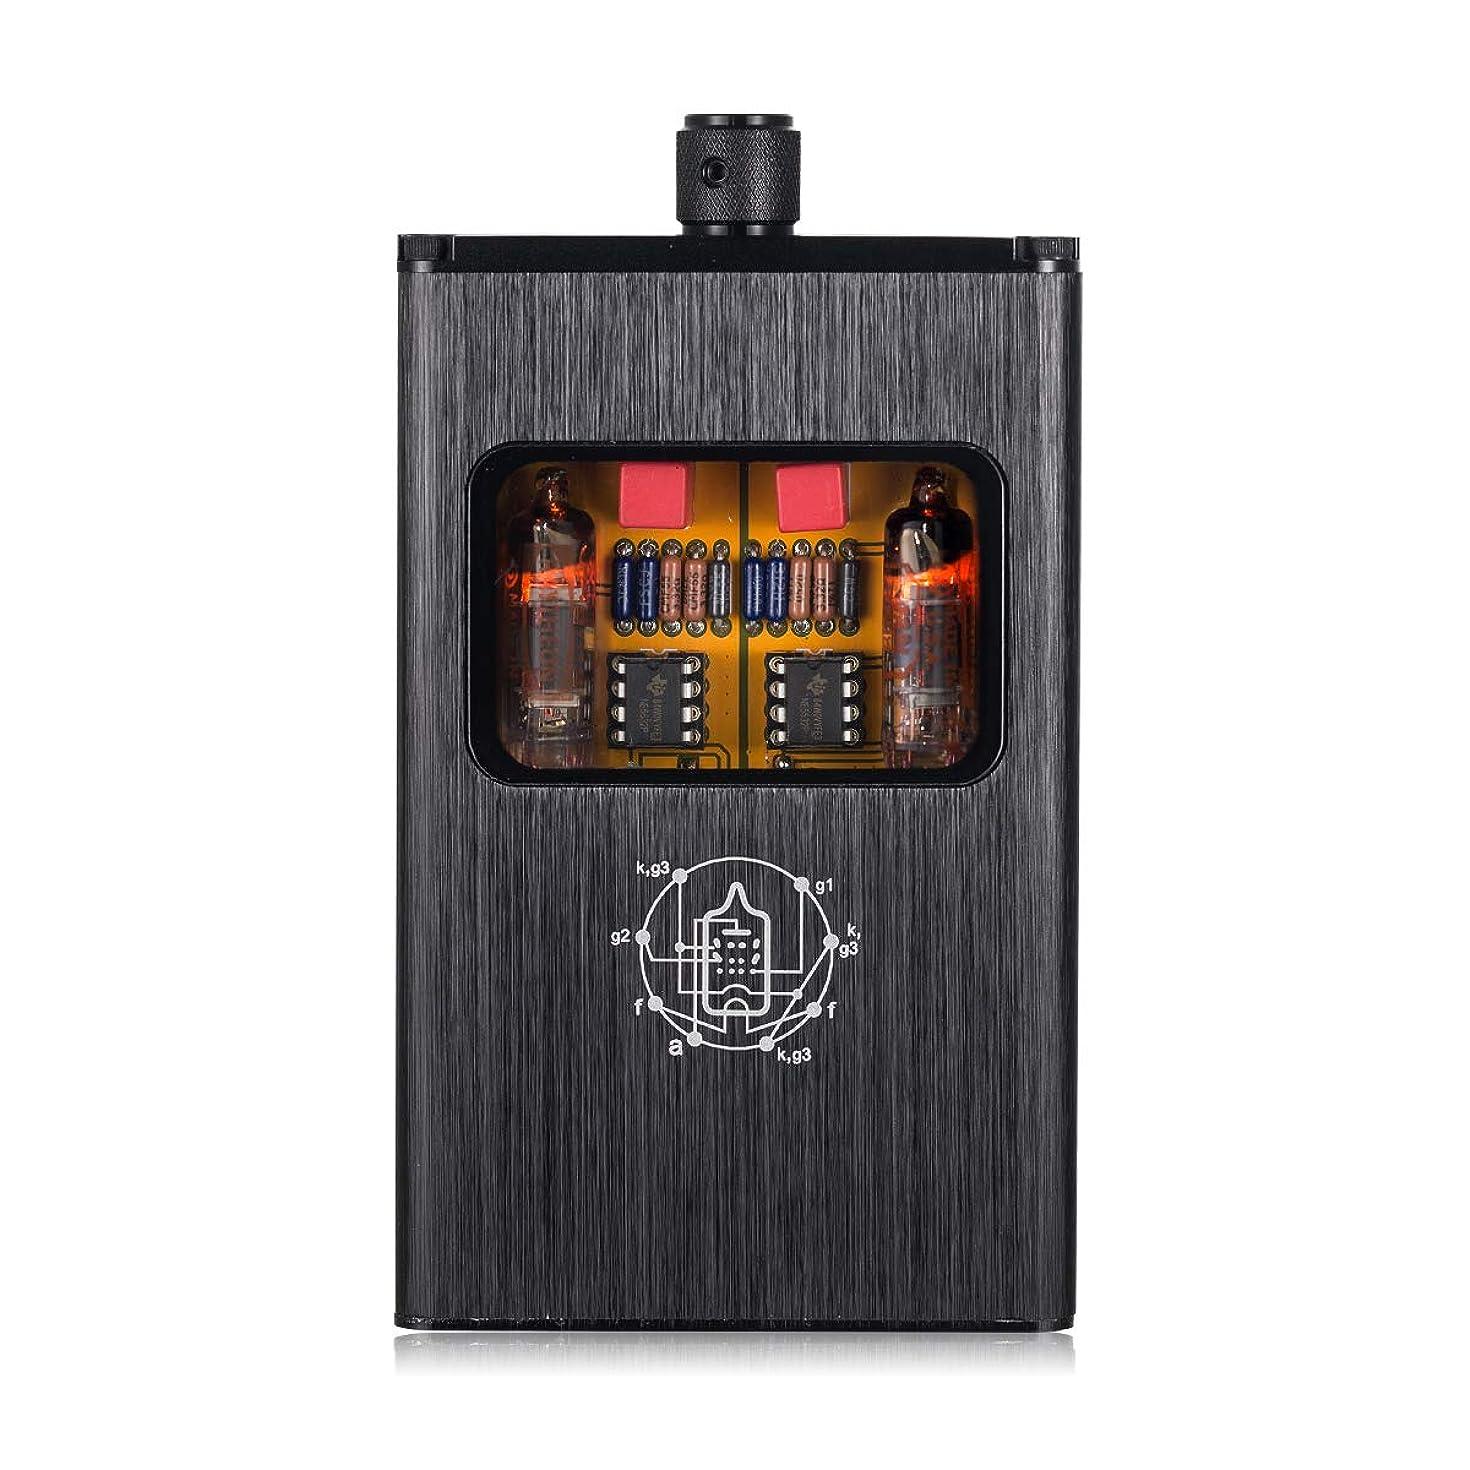 Little Bear B4-X Portable Dual-Mono Vacuum Tube Headphone Amplifier; Mini Balanced Audio Headphone Amp B4 Upgrade Version